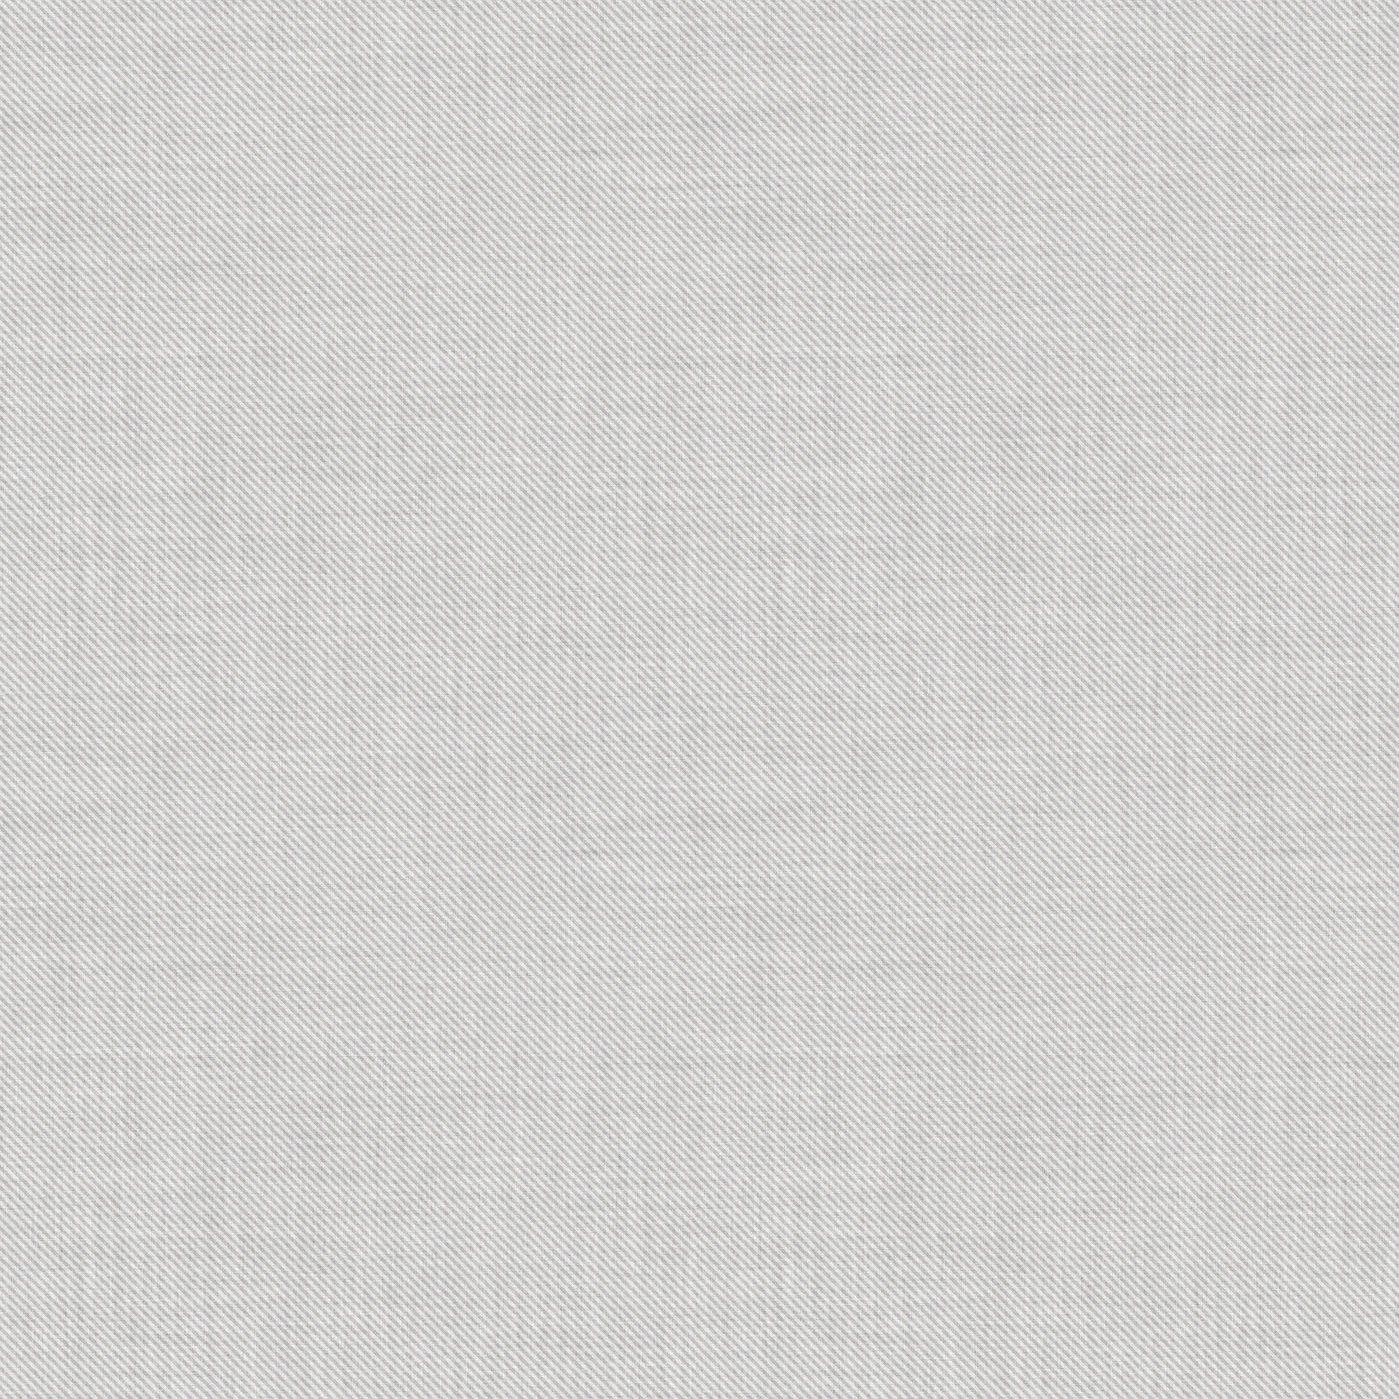 grey goo pattern - photo #12